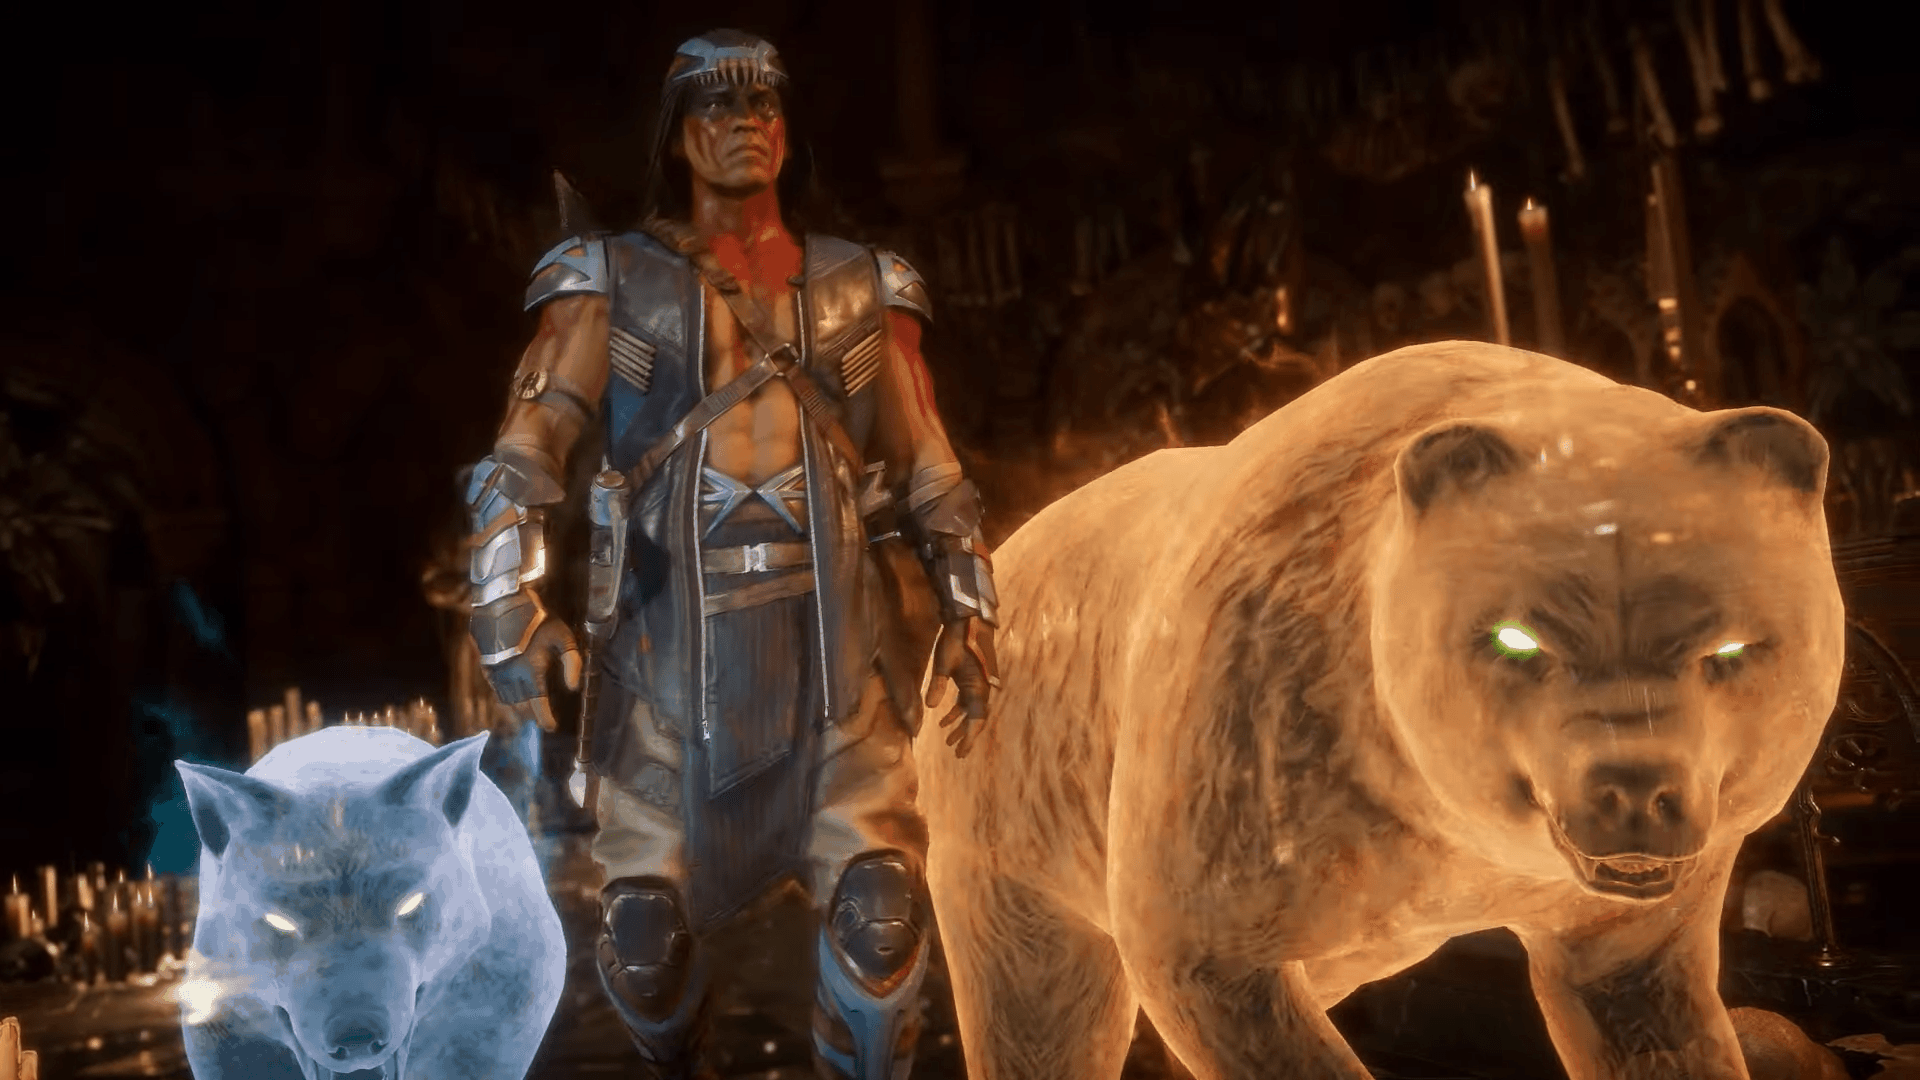 New Mortal Kombat 11 Gameplay Trailer Showcases The Next Playable Character – Nightwolf